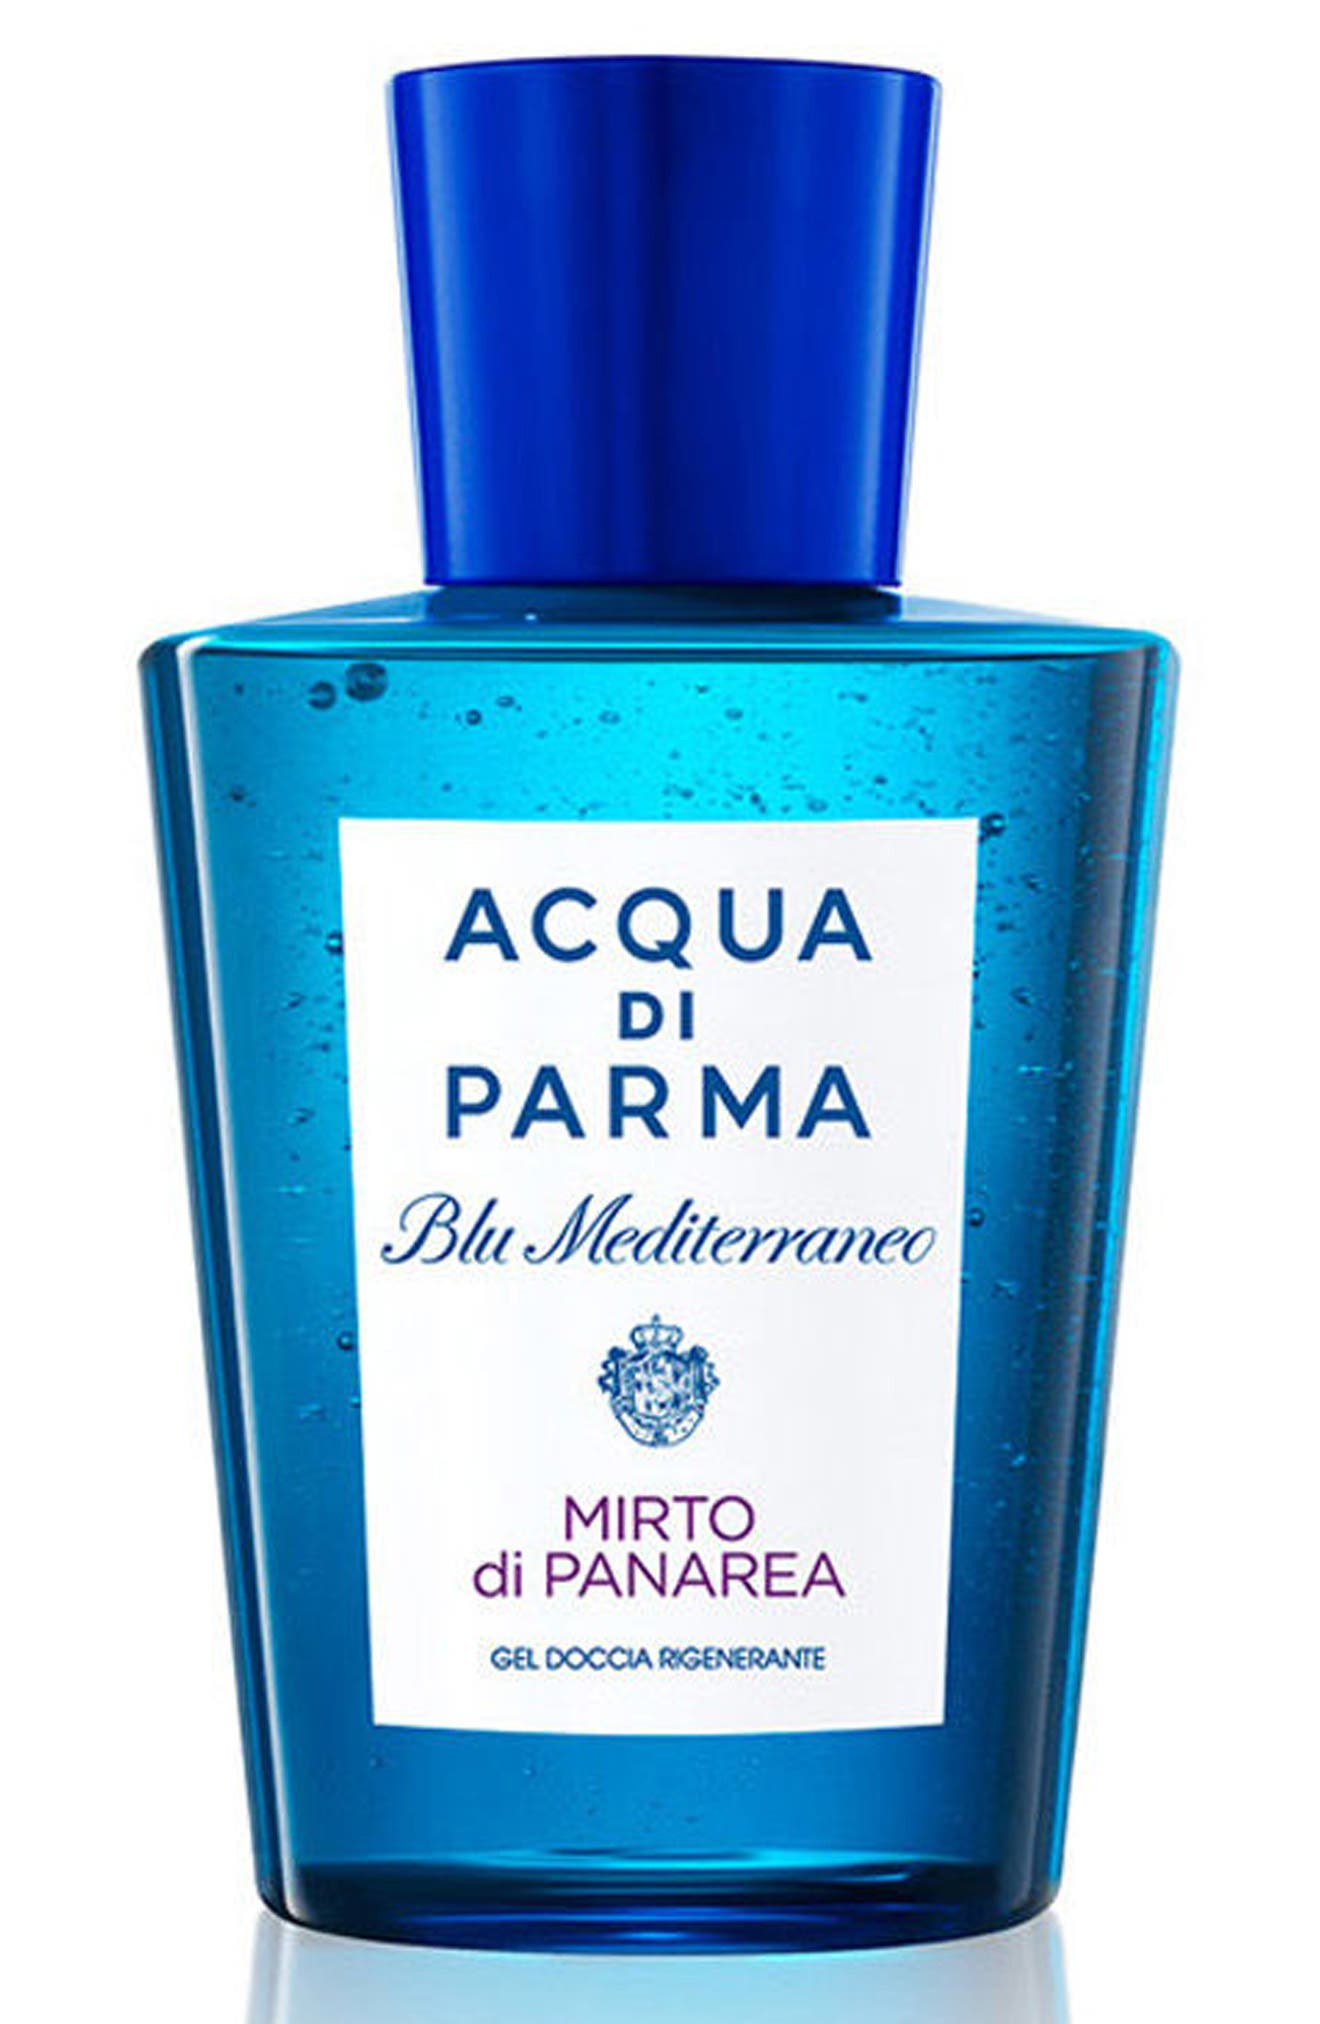 Main Image - Acqua di Parma 'Blu Mediterraneo - Mirto di Panarea' Shower Gel